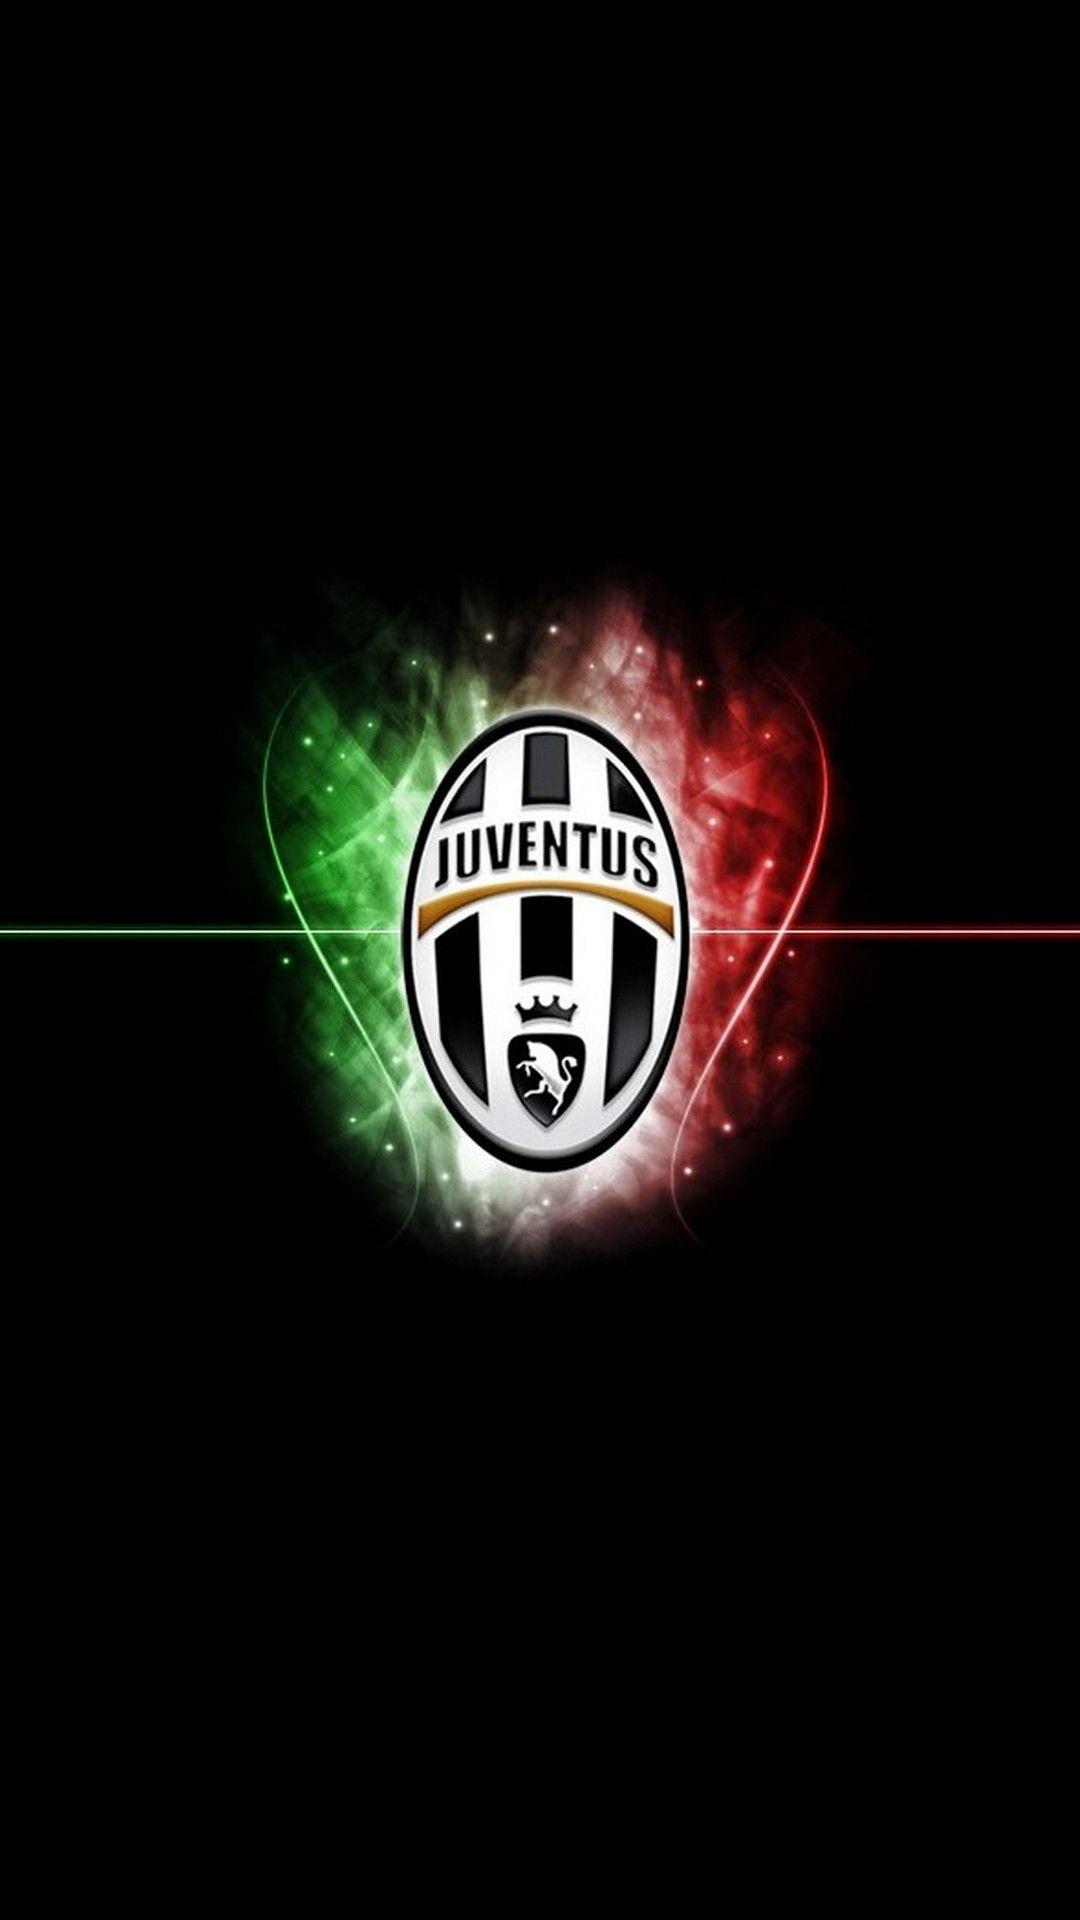 c9b5b1098d02 Juventus Logo iPhone Wallpaper - Best iPhone Wallpaper